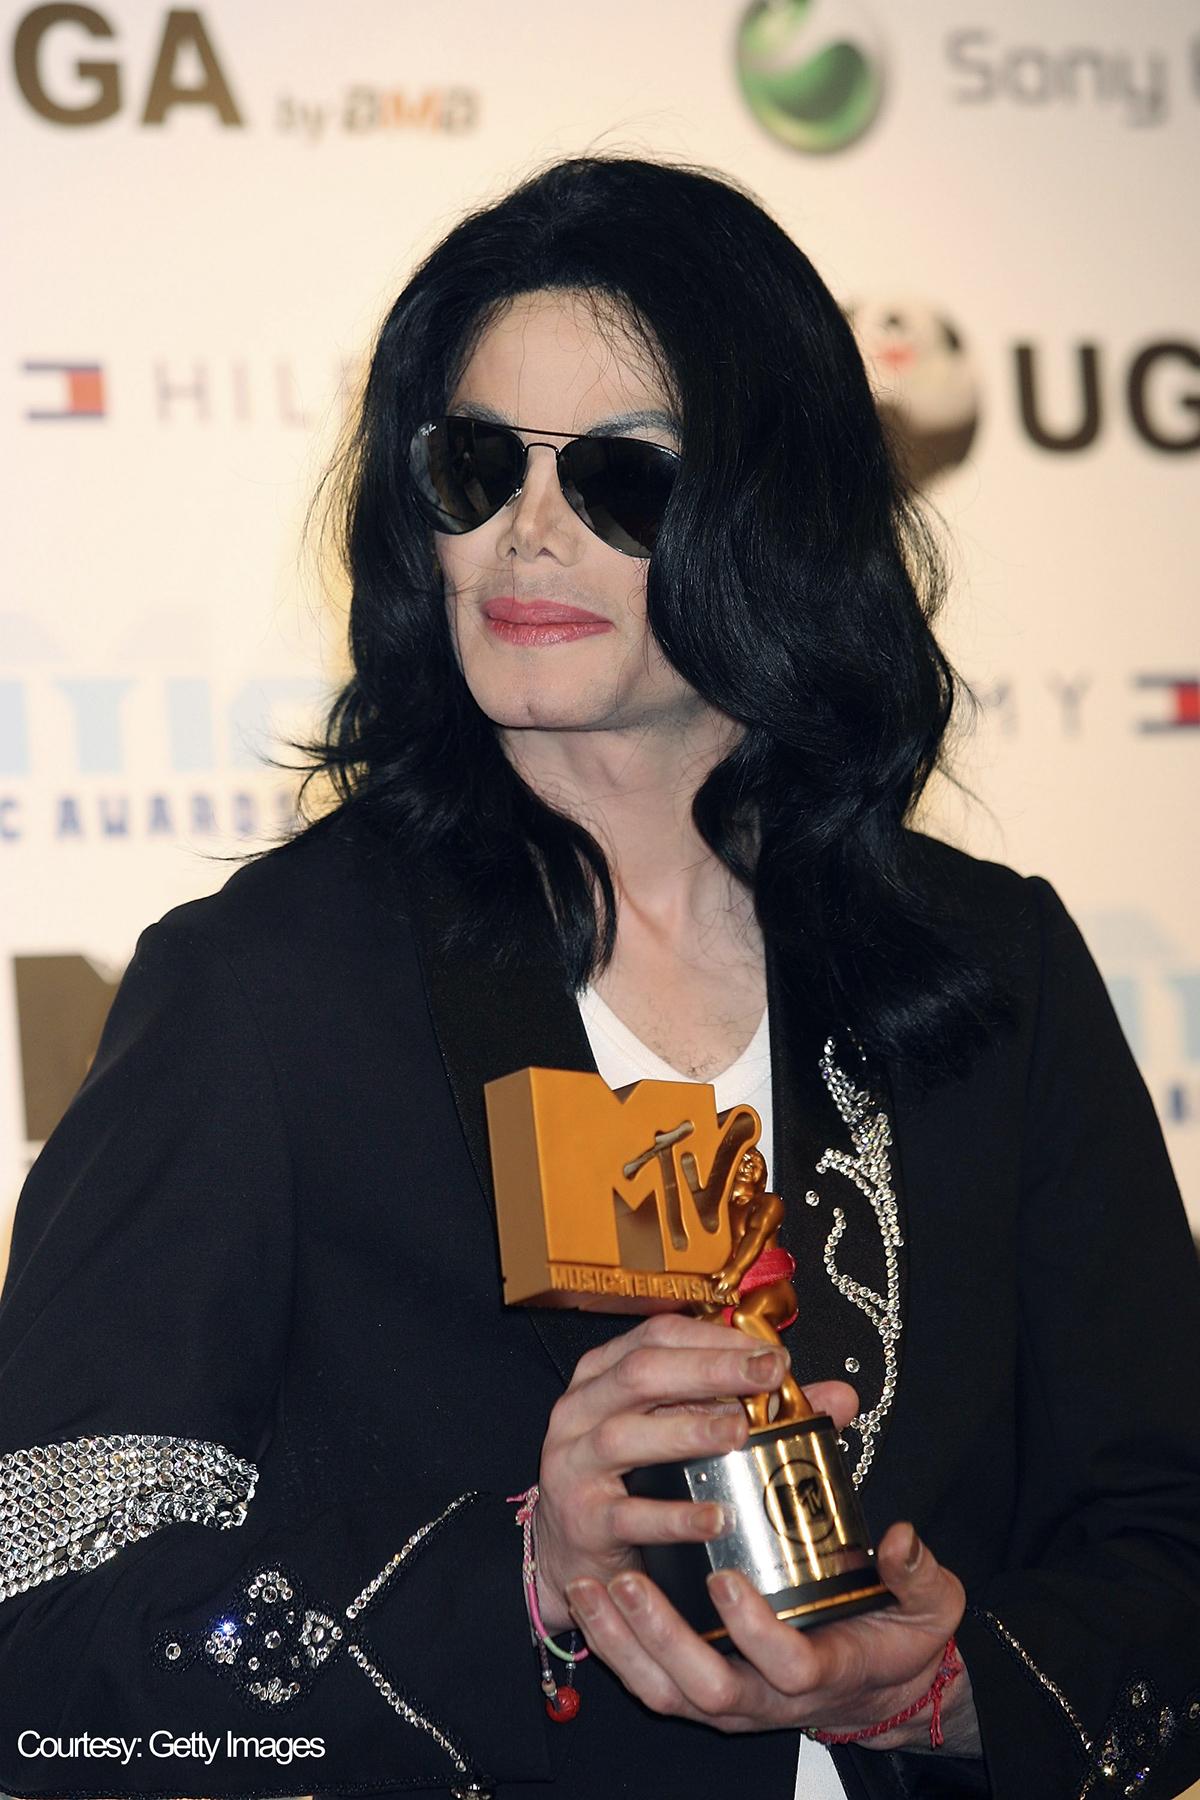 Michael Jackson receives Legend Award at 2006 MTV Video Music Awards in Tokyo, Japan on May 27, 2006